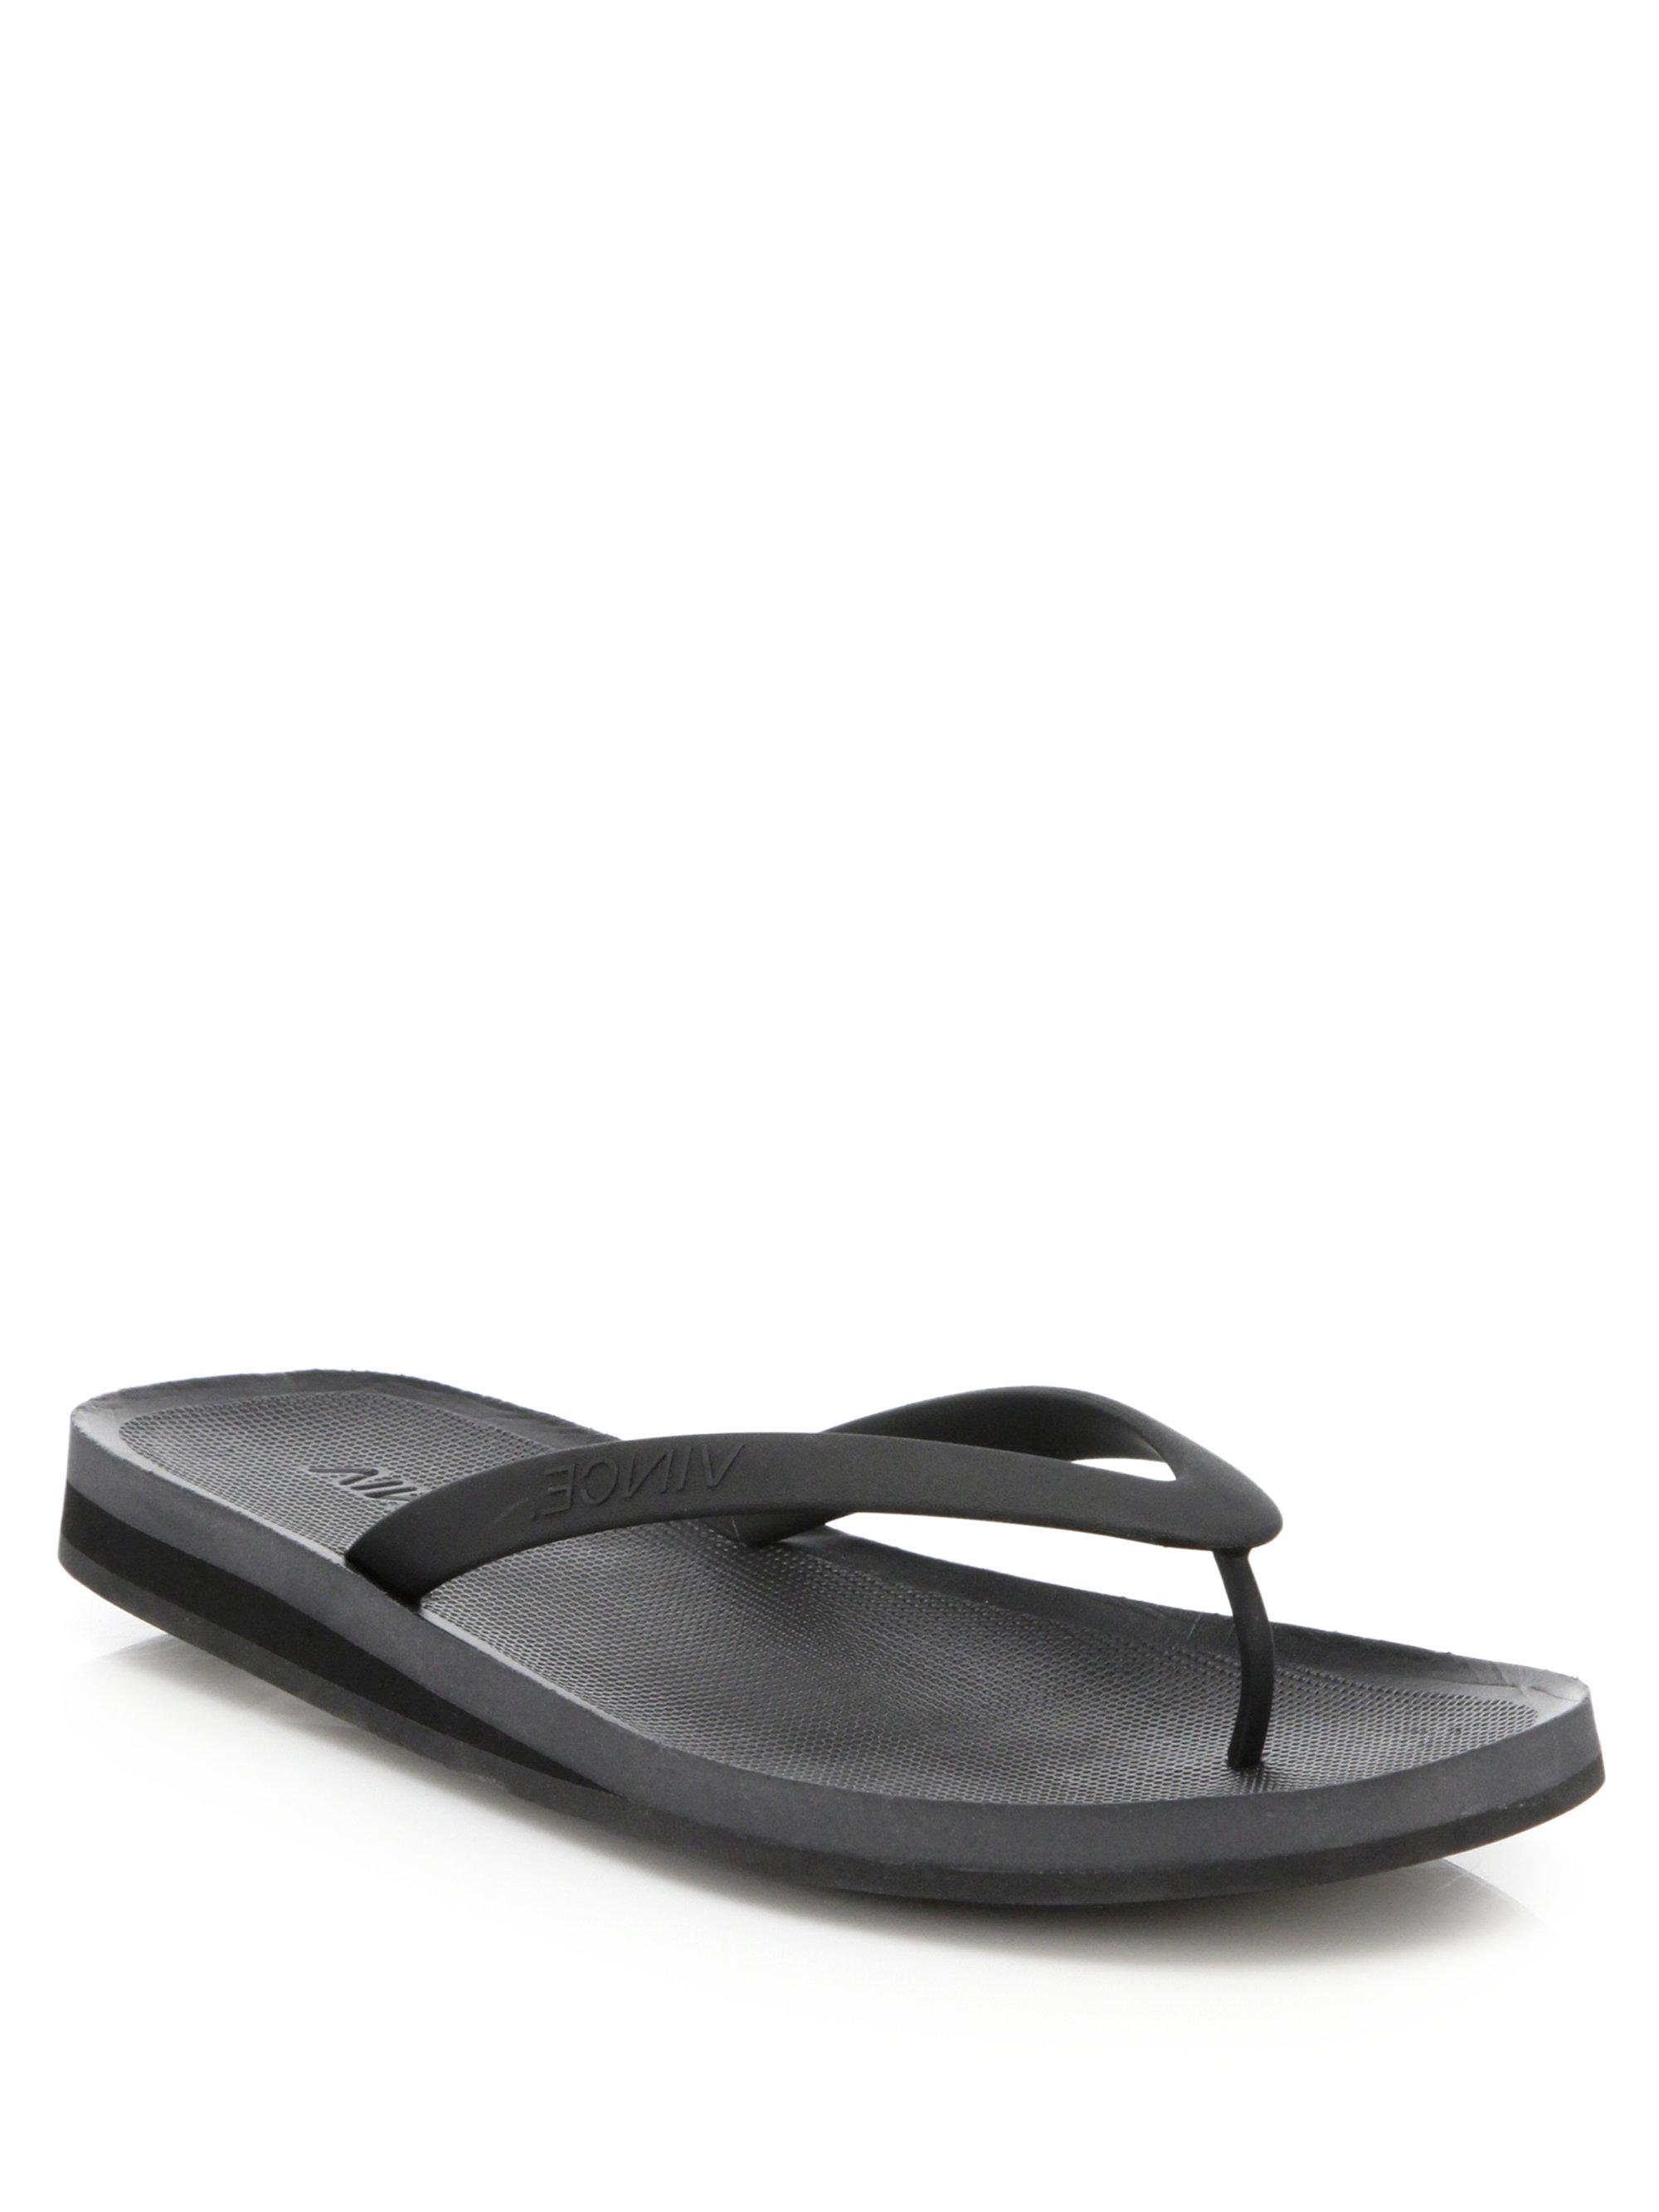 a9a892922294 Lyst - Vince Tyler Flip Flops in Black for Men